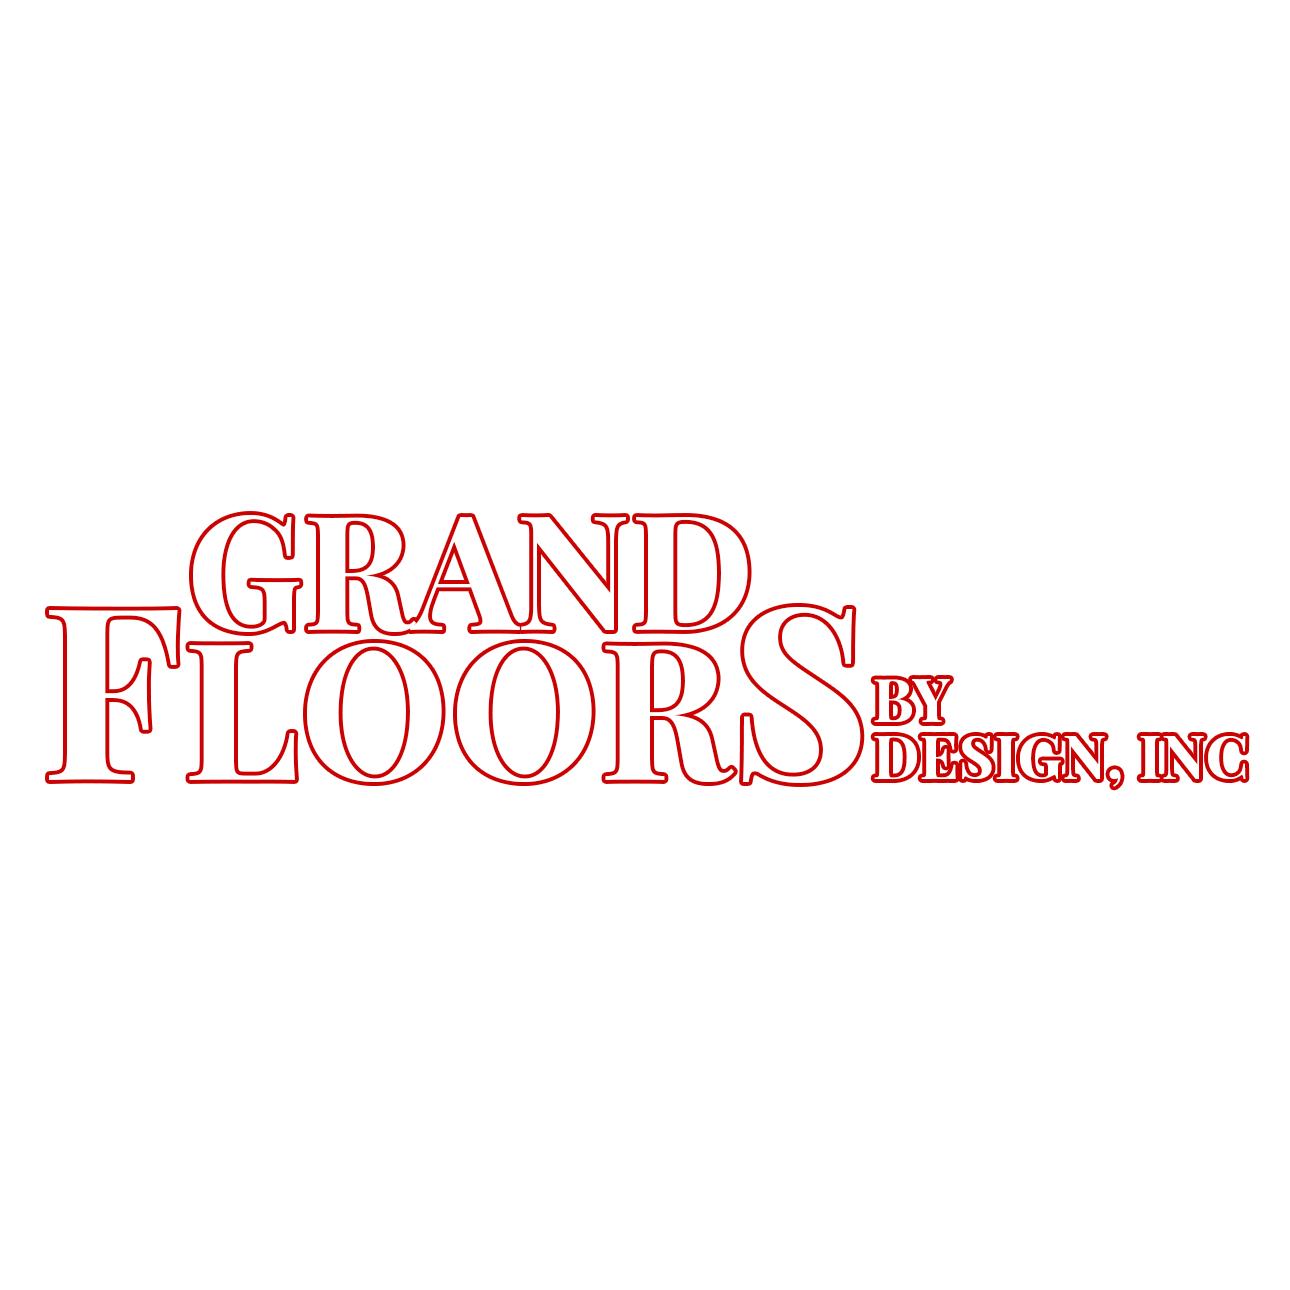 Grand Floors By Design, Inc